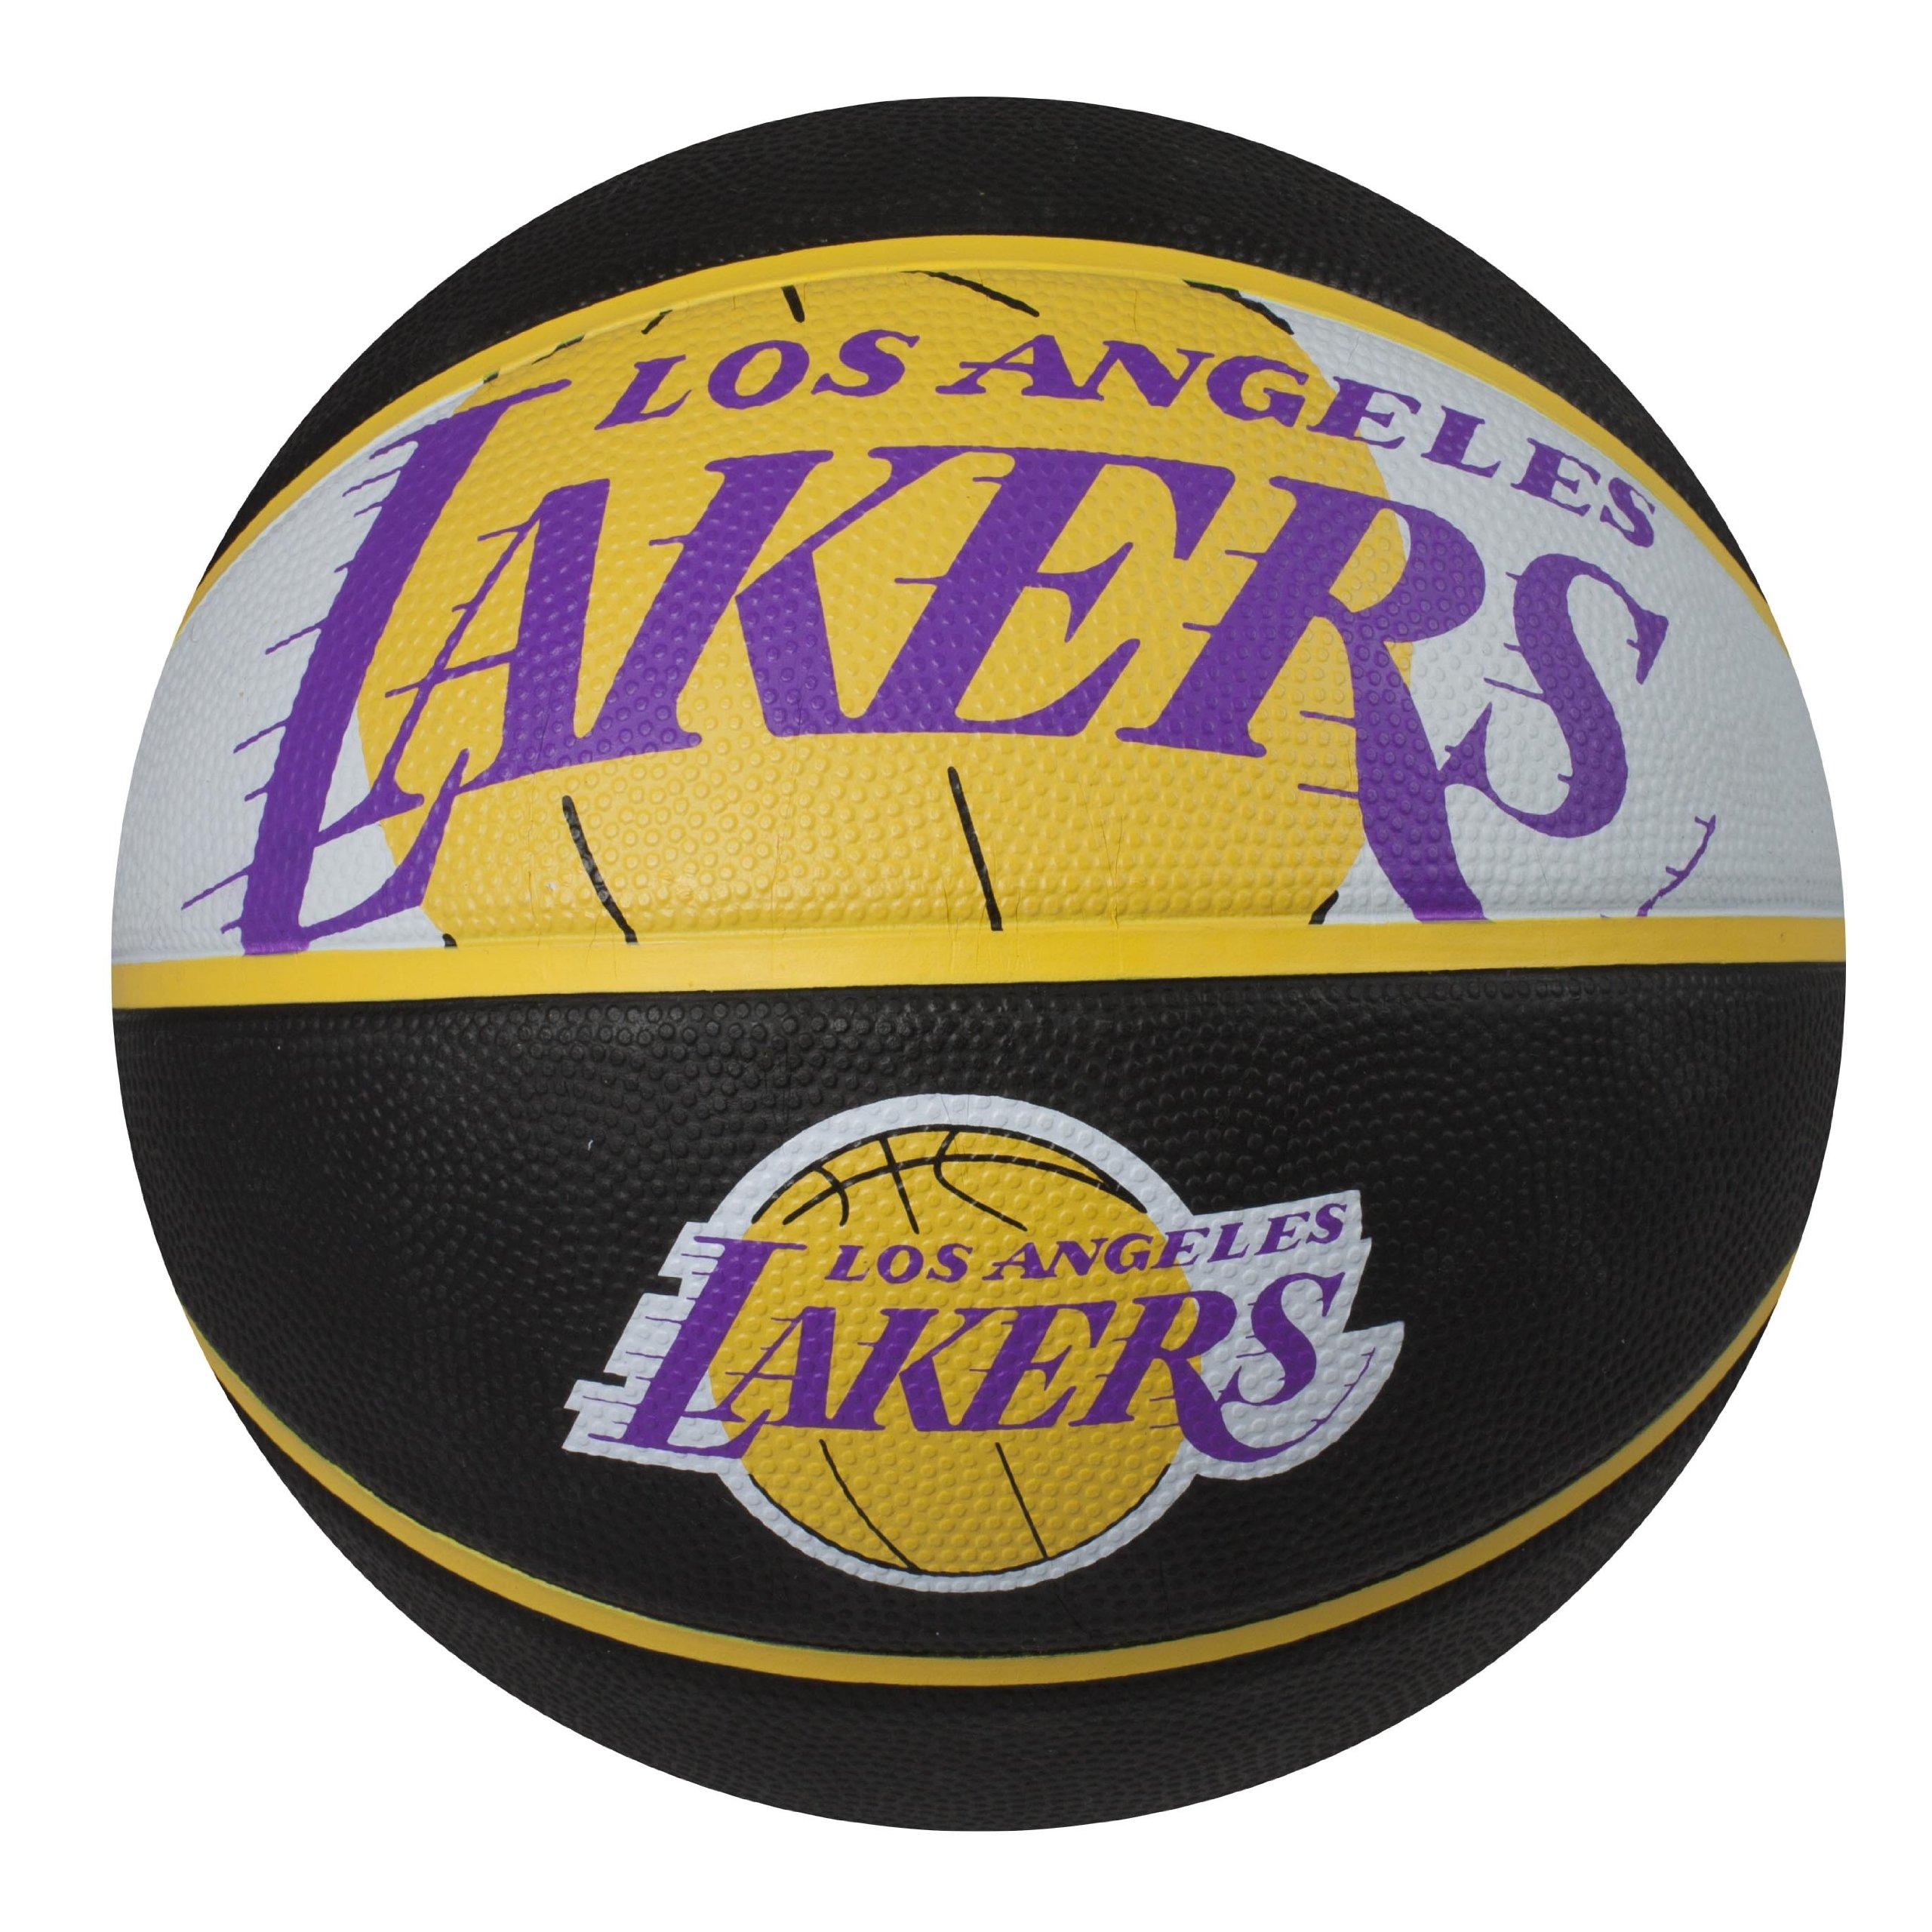 Nba Basketball Los Angeles Lakers: Rubber Team Logo LA Lakers Durable Outdoor Material